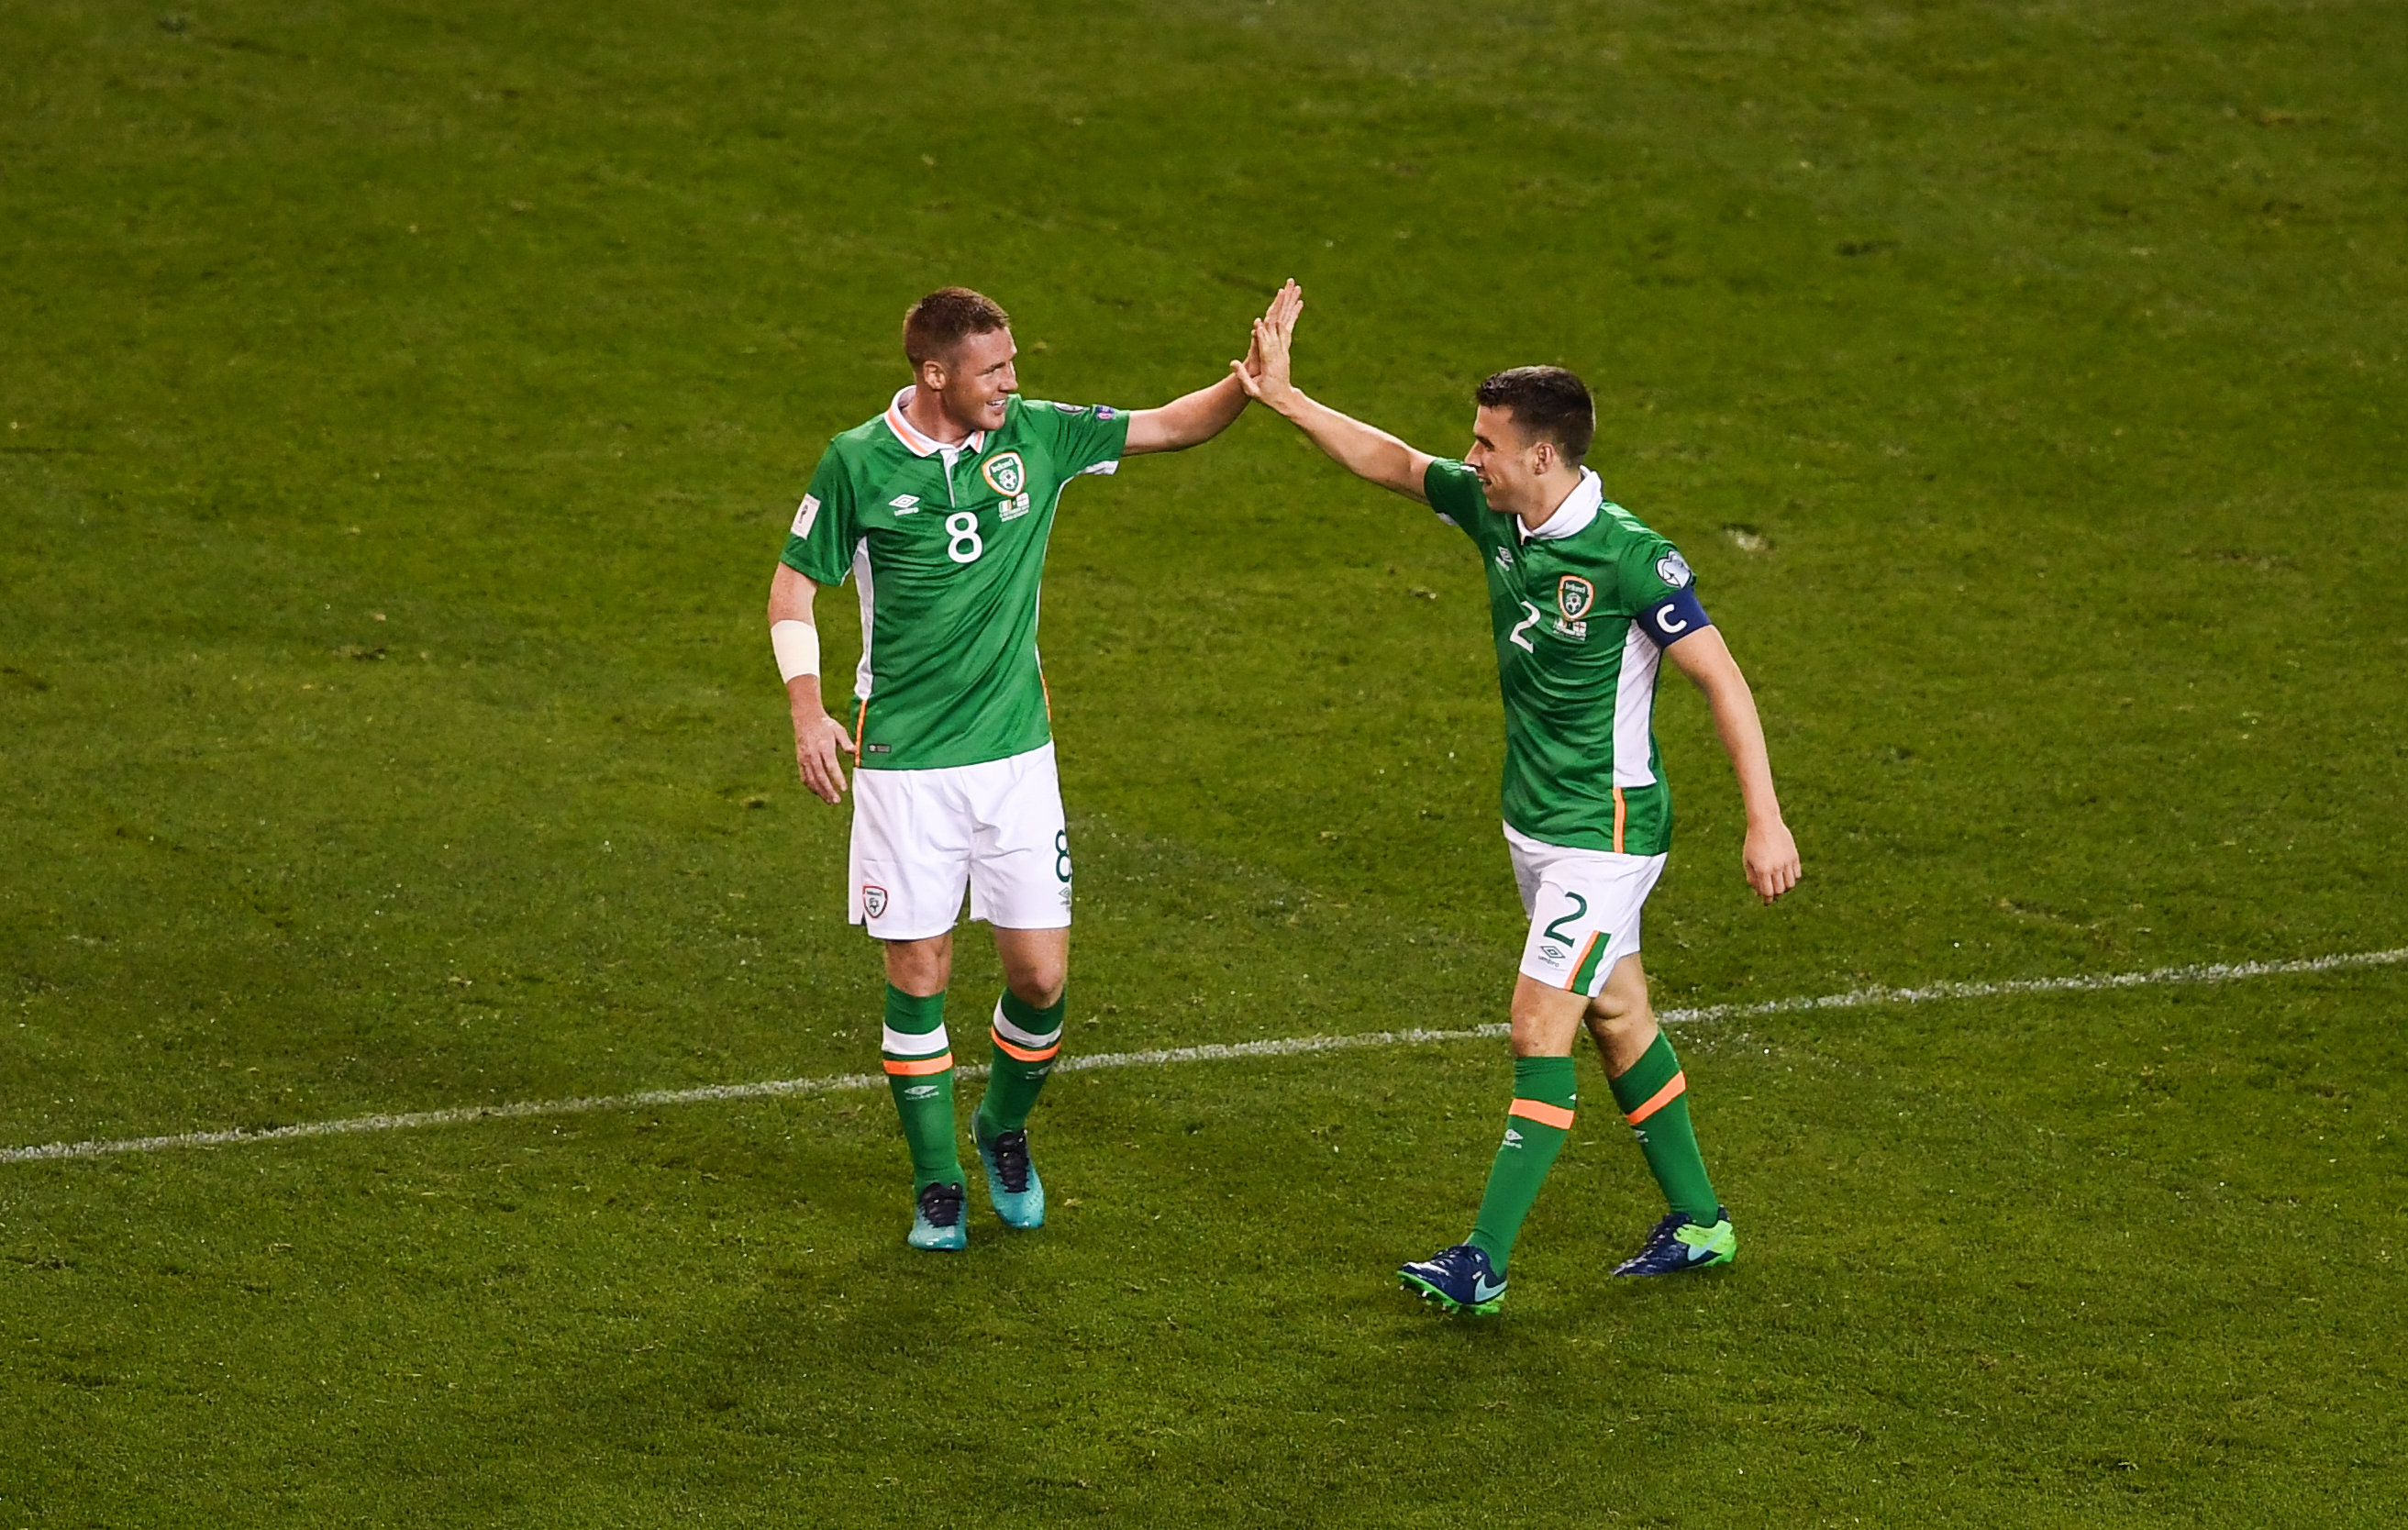 Republic of Ireland v Georgia - FIFA World Cup Group D Qualifier